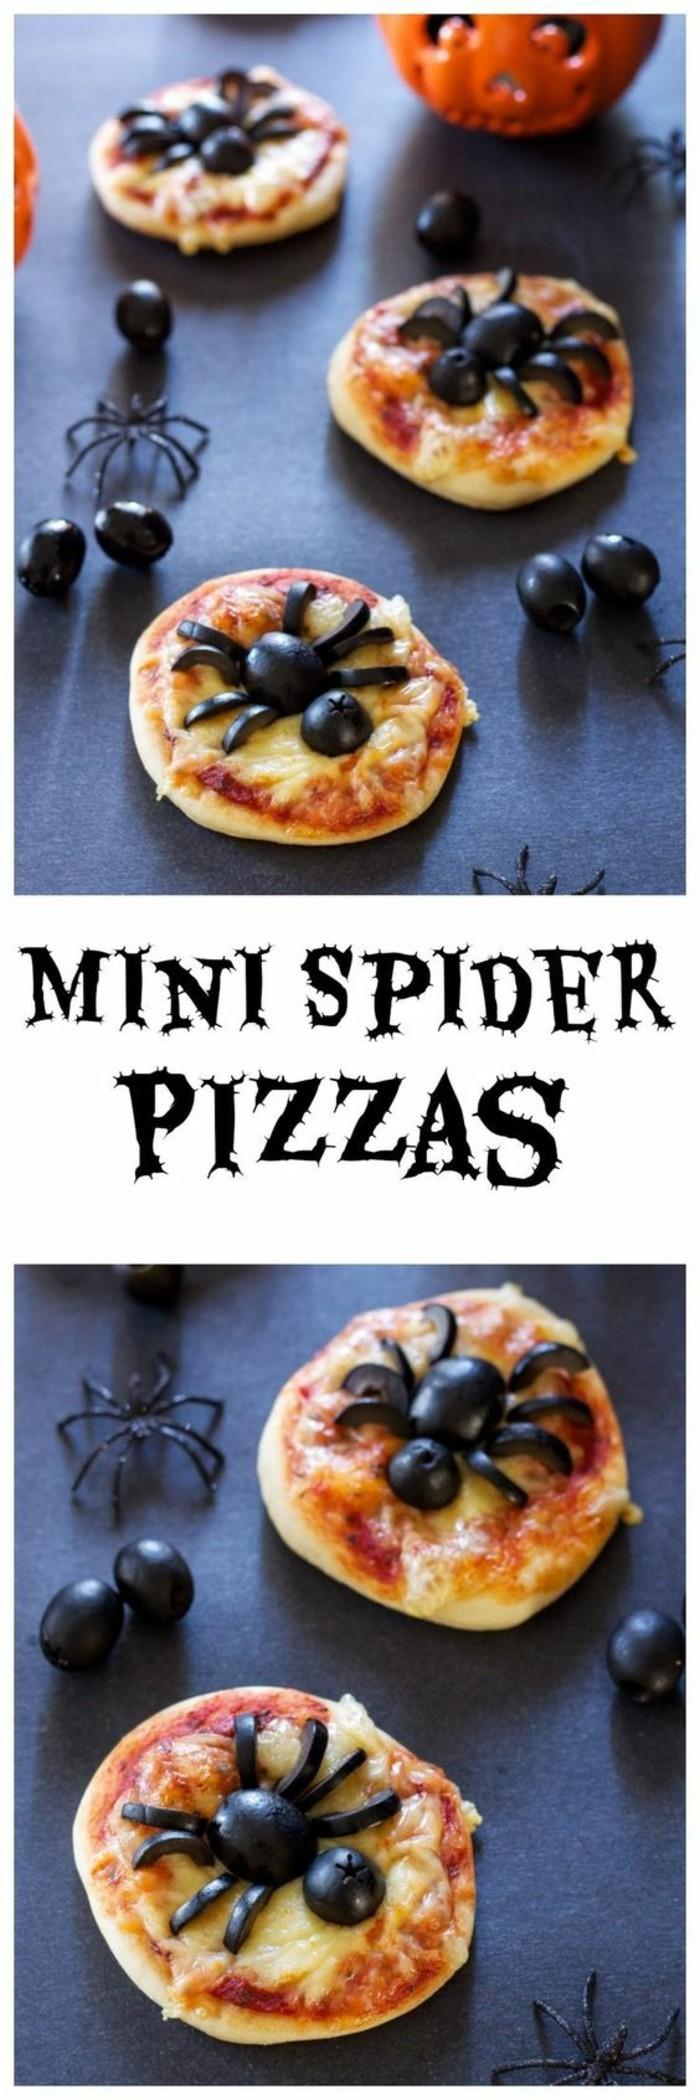 miraculeuse-soiree-sorciere-belle-costume-idee-vos-pizza-mini